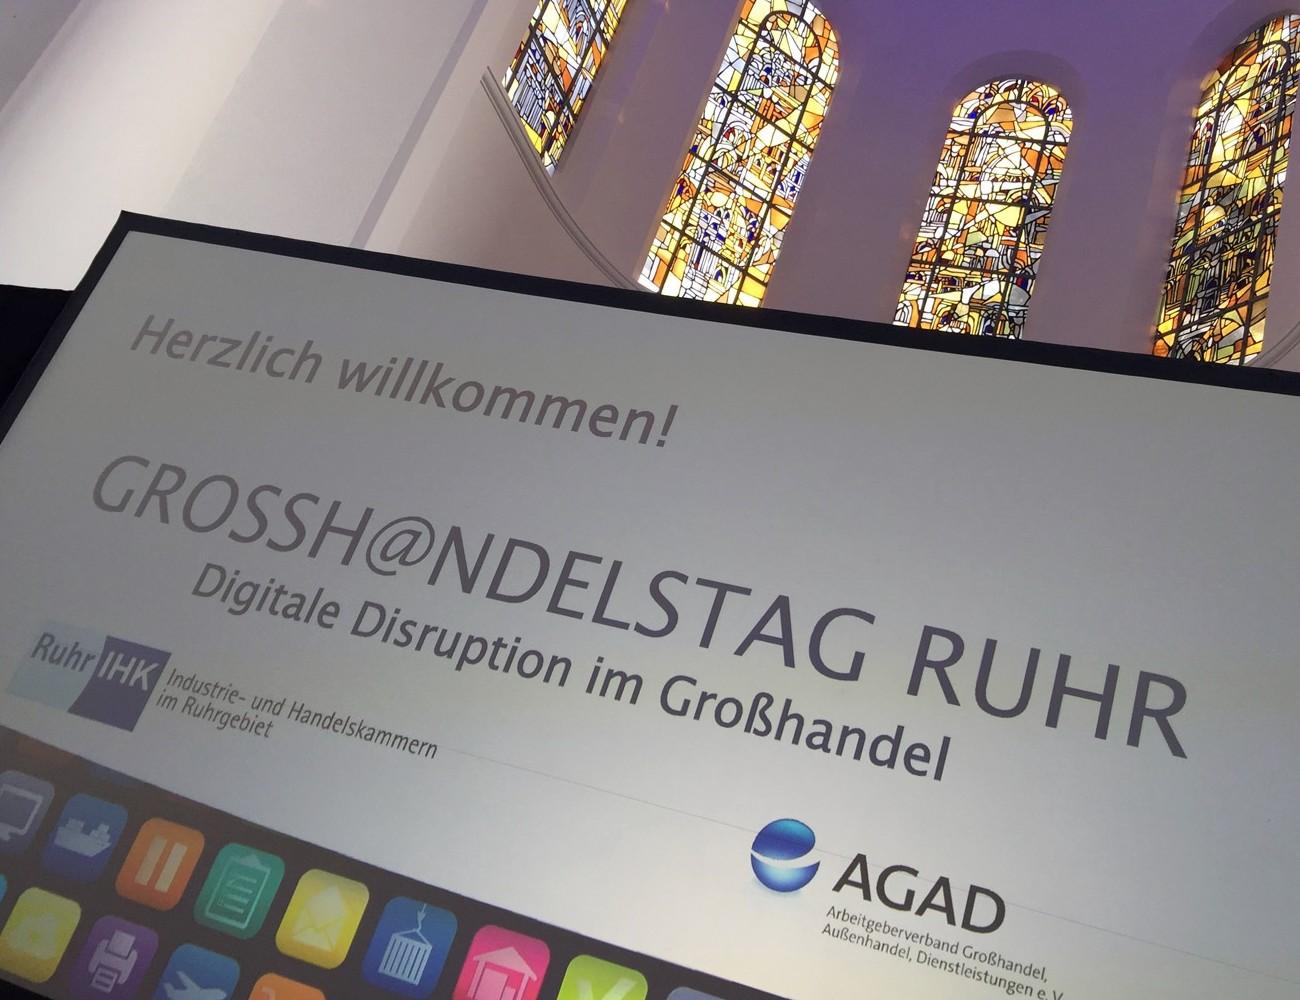 Großh@ndelstag Ruhr